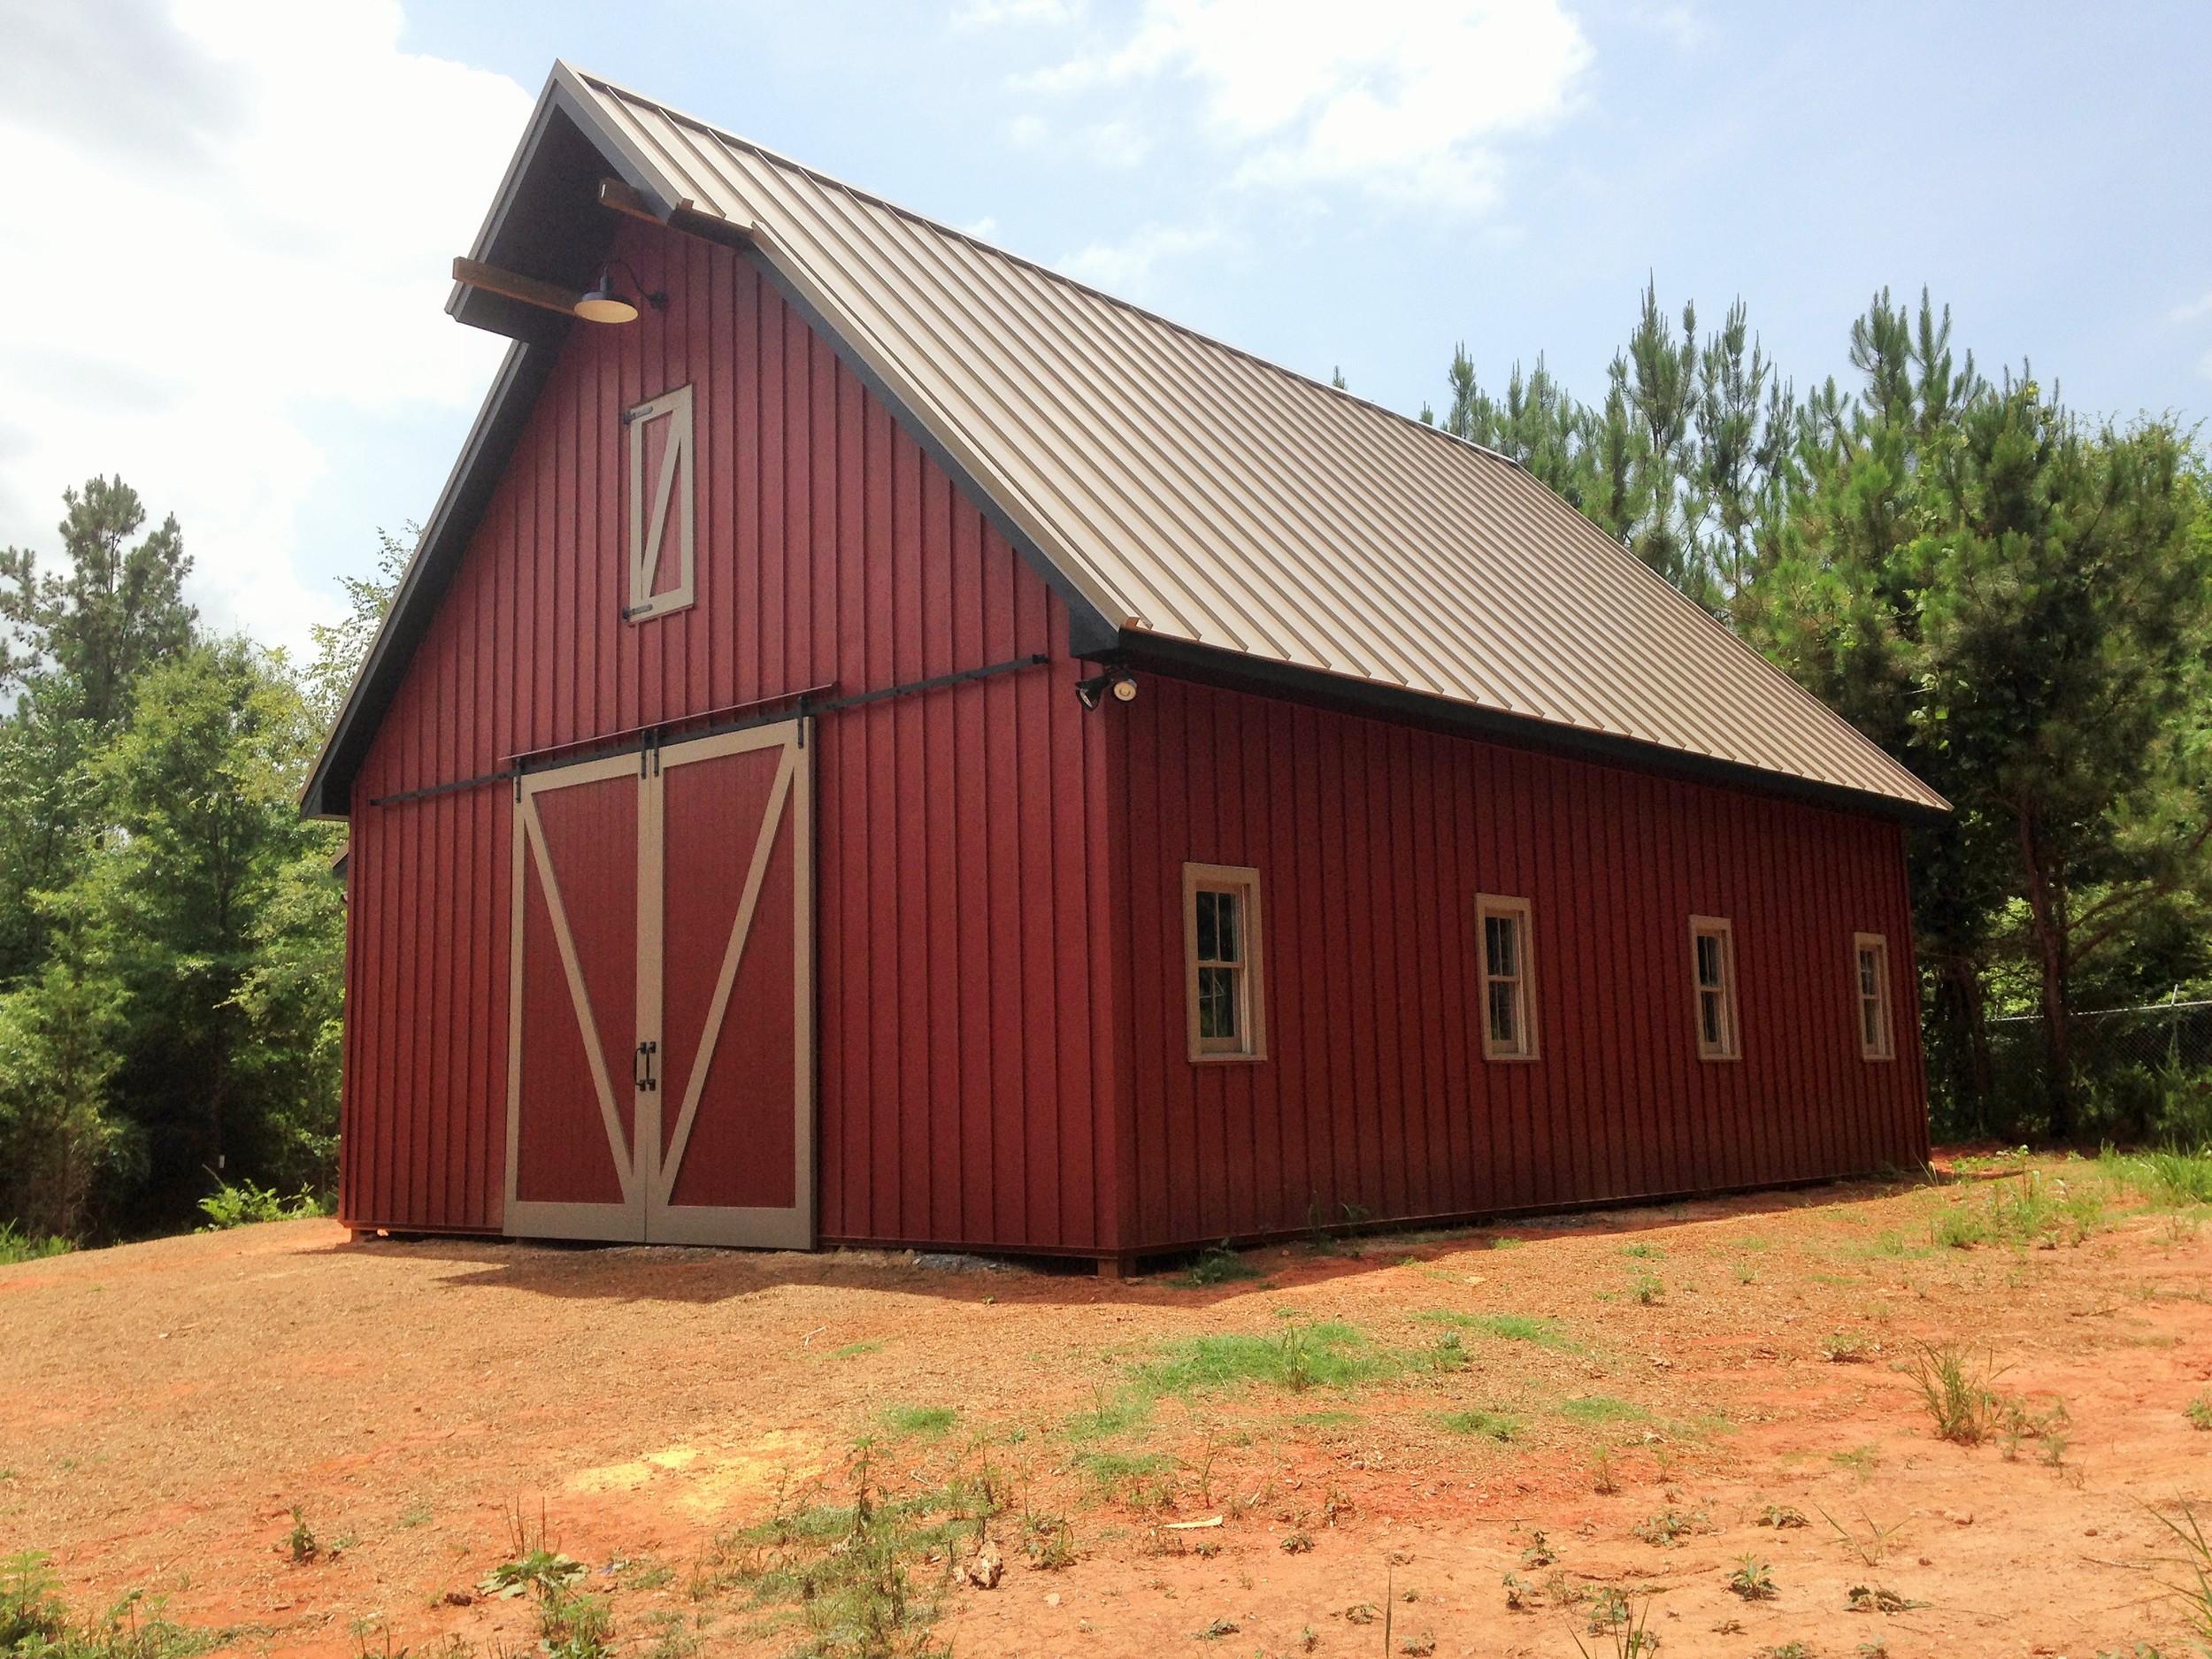 Barn - Rock Hill, SC, G&H Architect Builders, Nik Radovanovic